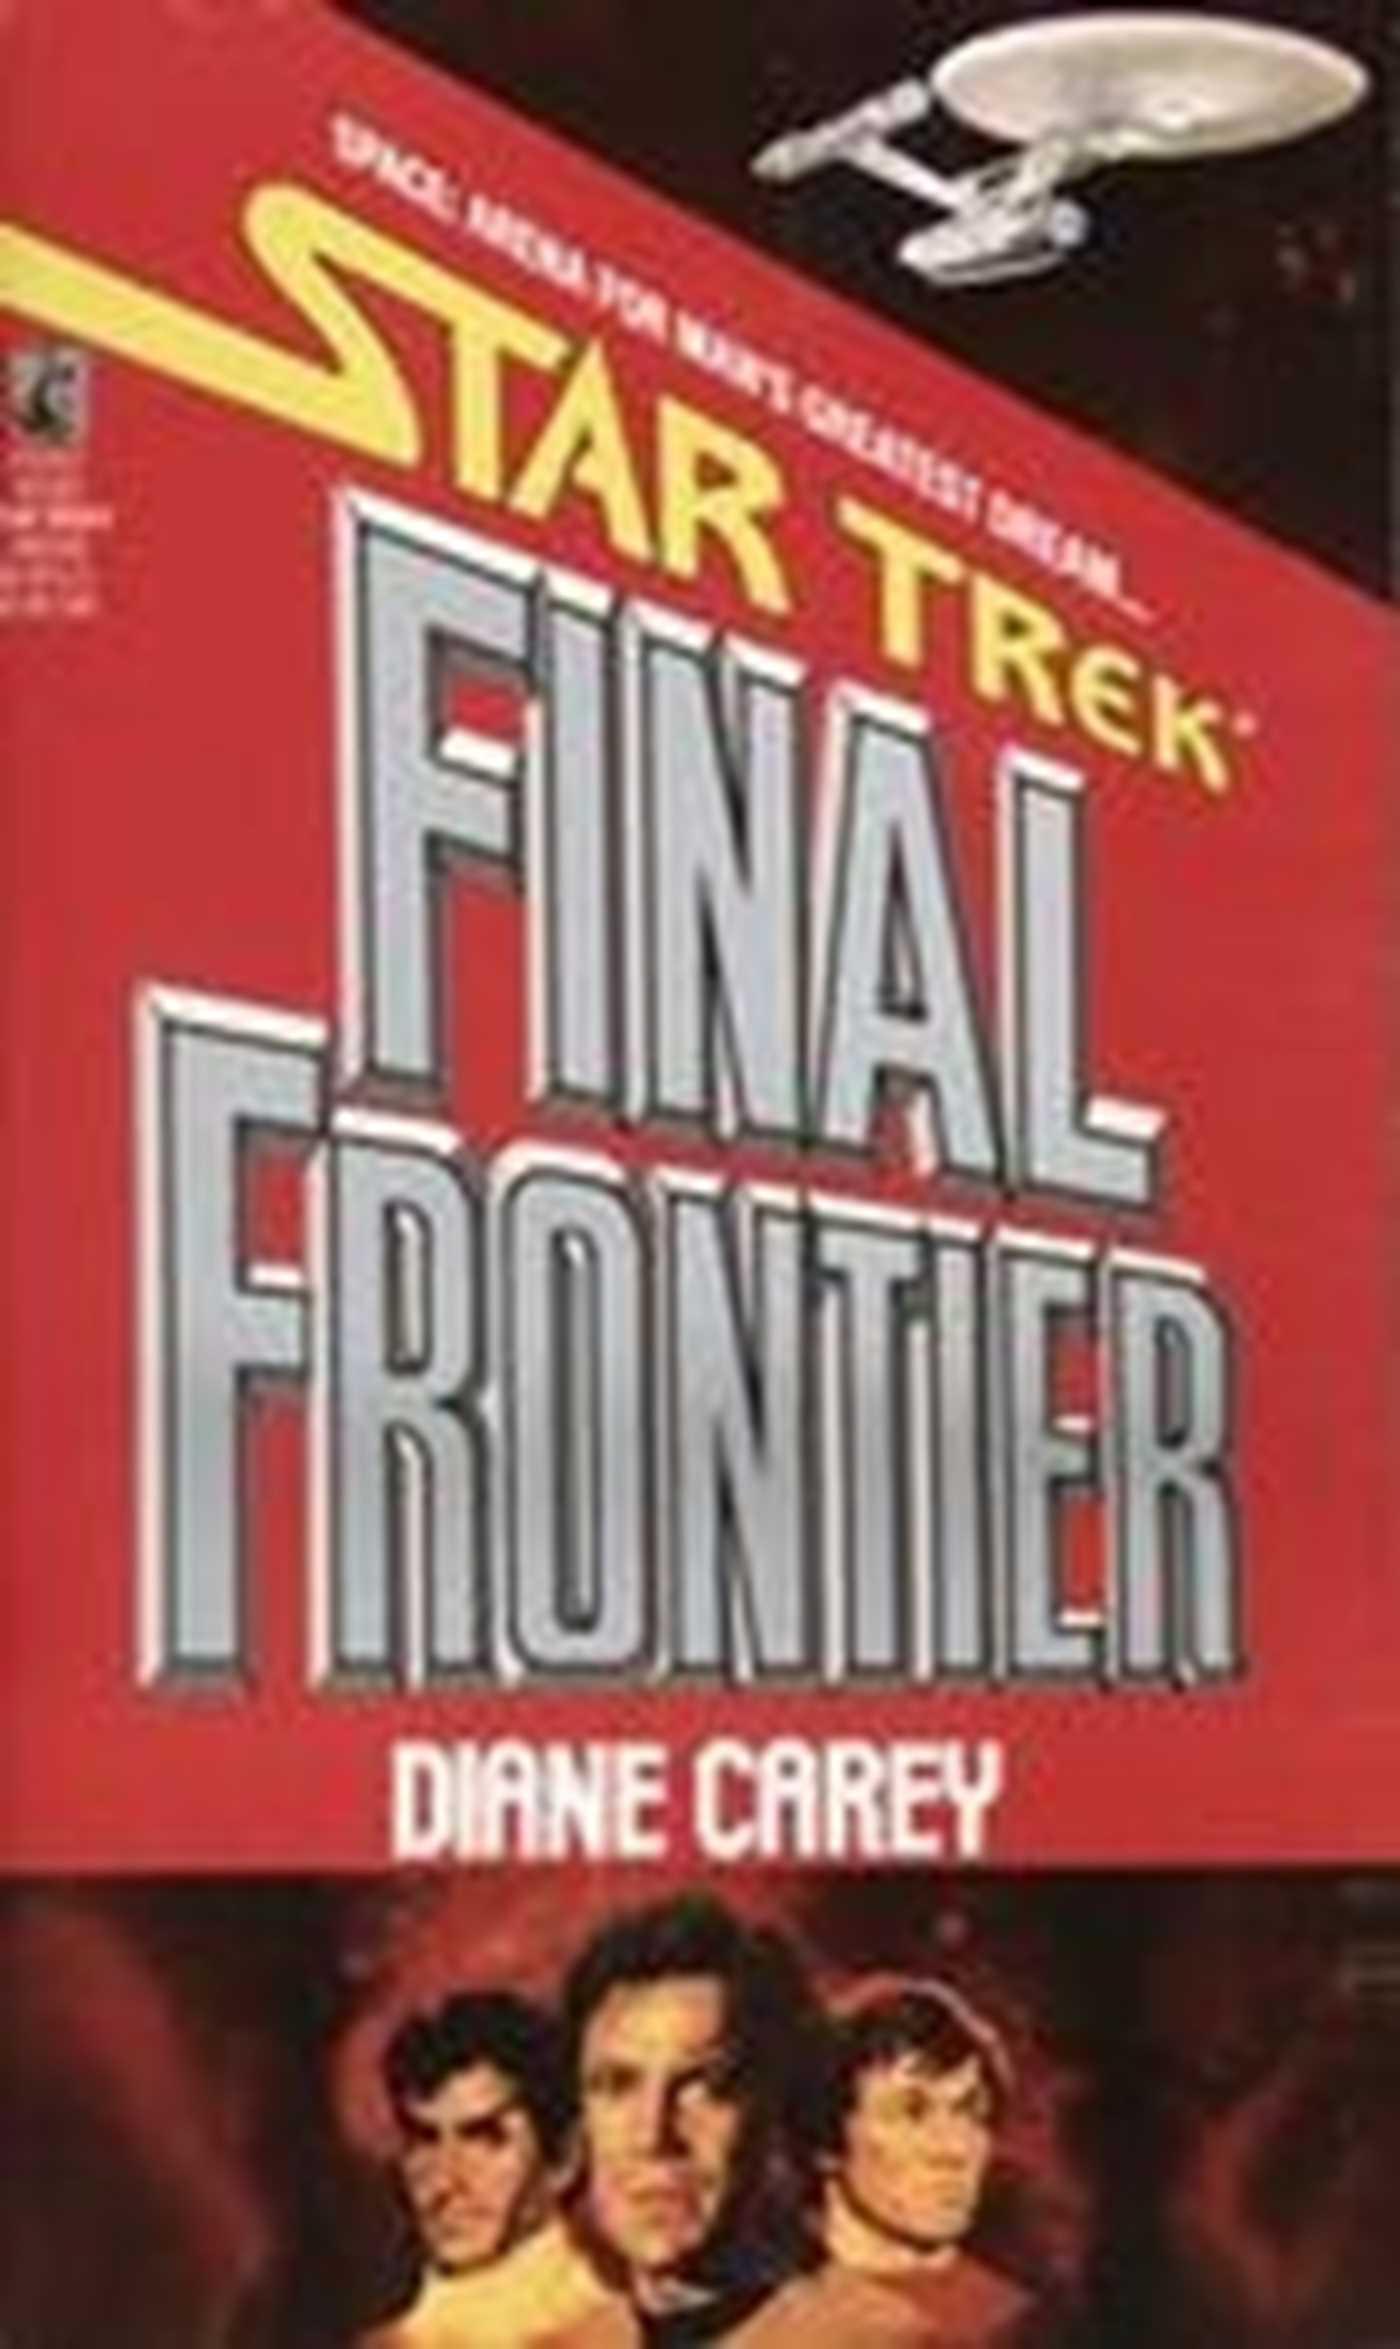 Star trek the original series final frontier 9780743454261 hr